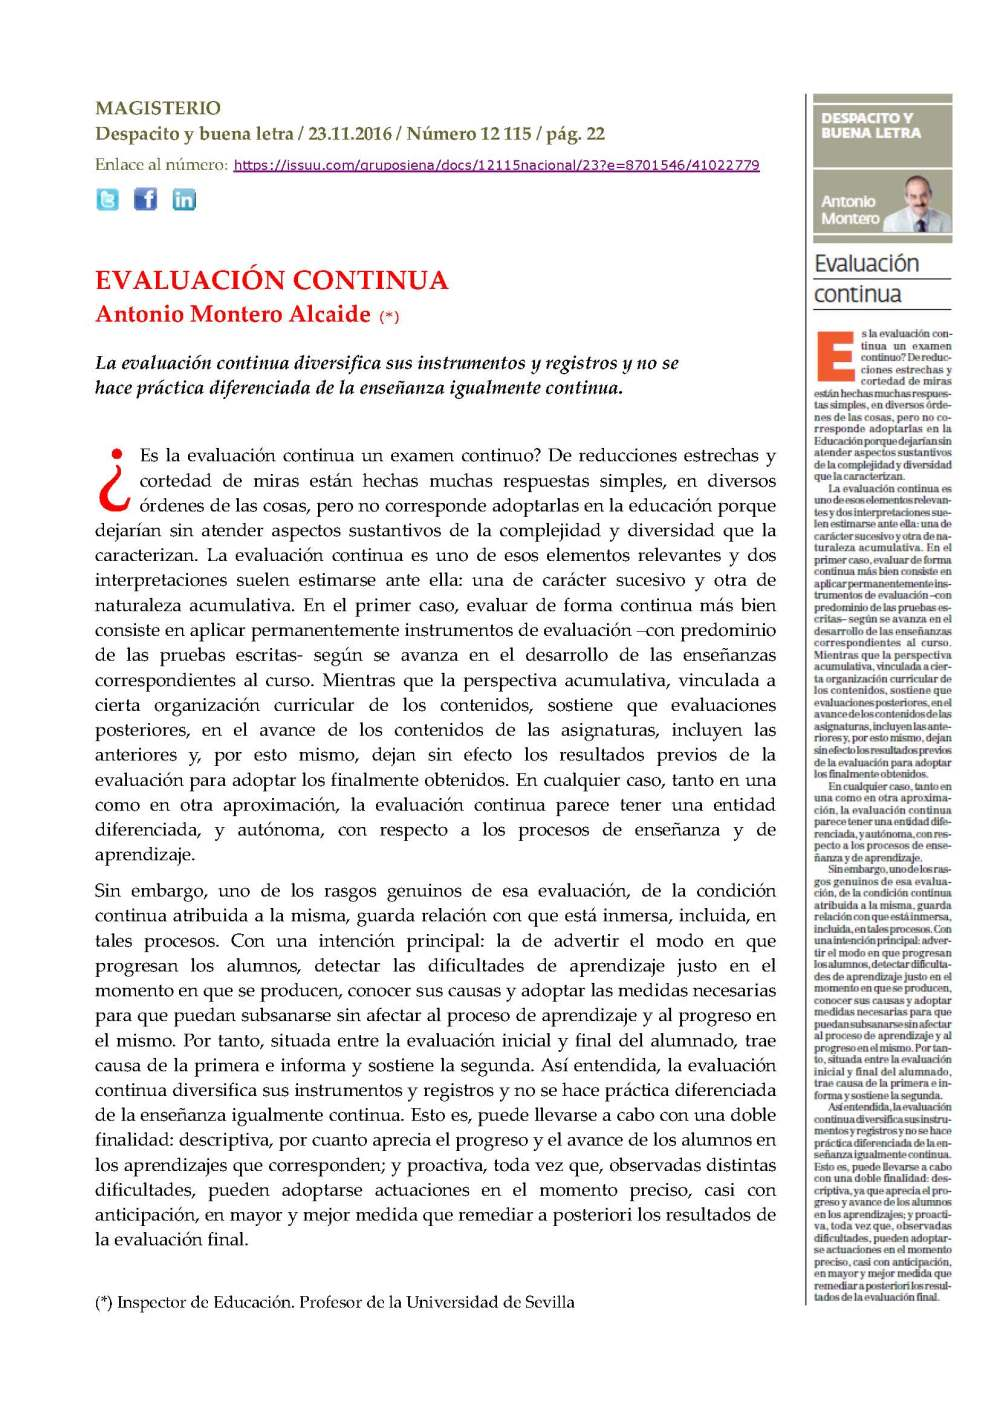 69-evaluacion-continua-magisterio-23-11-2016-pag-22